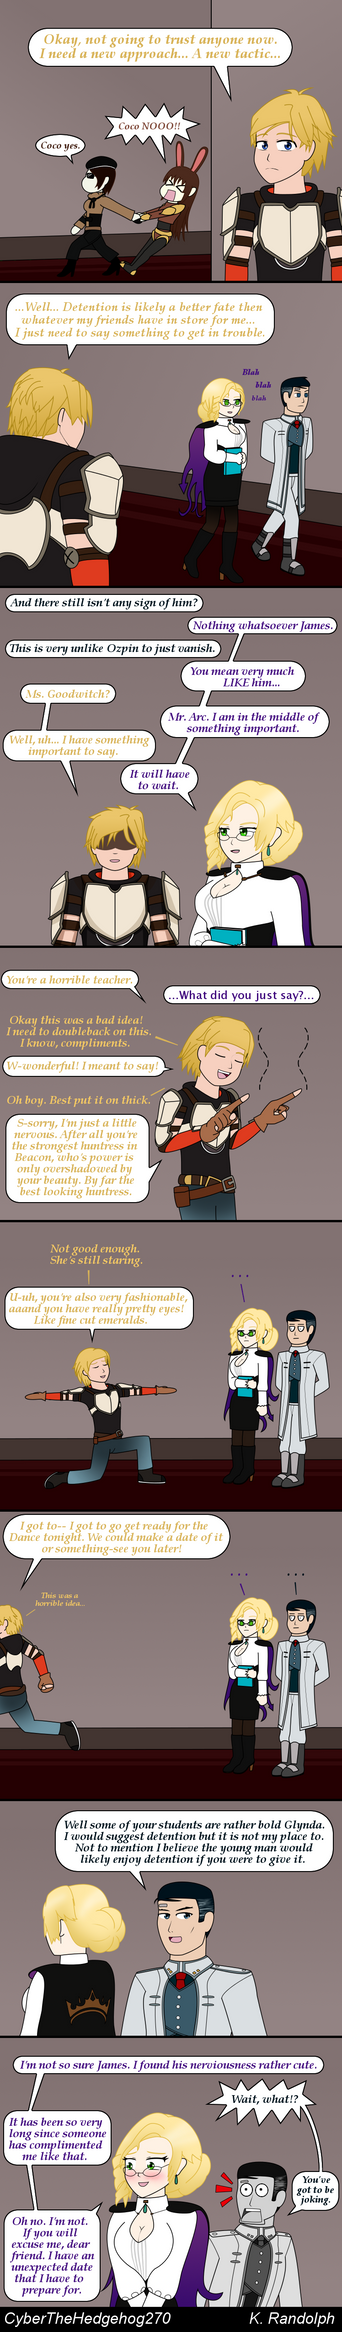 RWBY Date Night (S2) Part 3 by CyberTheHedgehog270